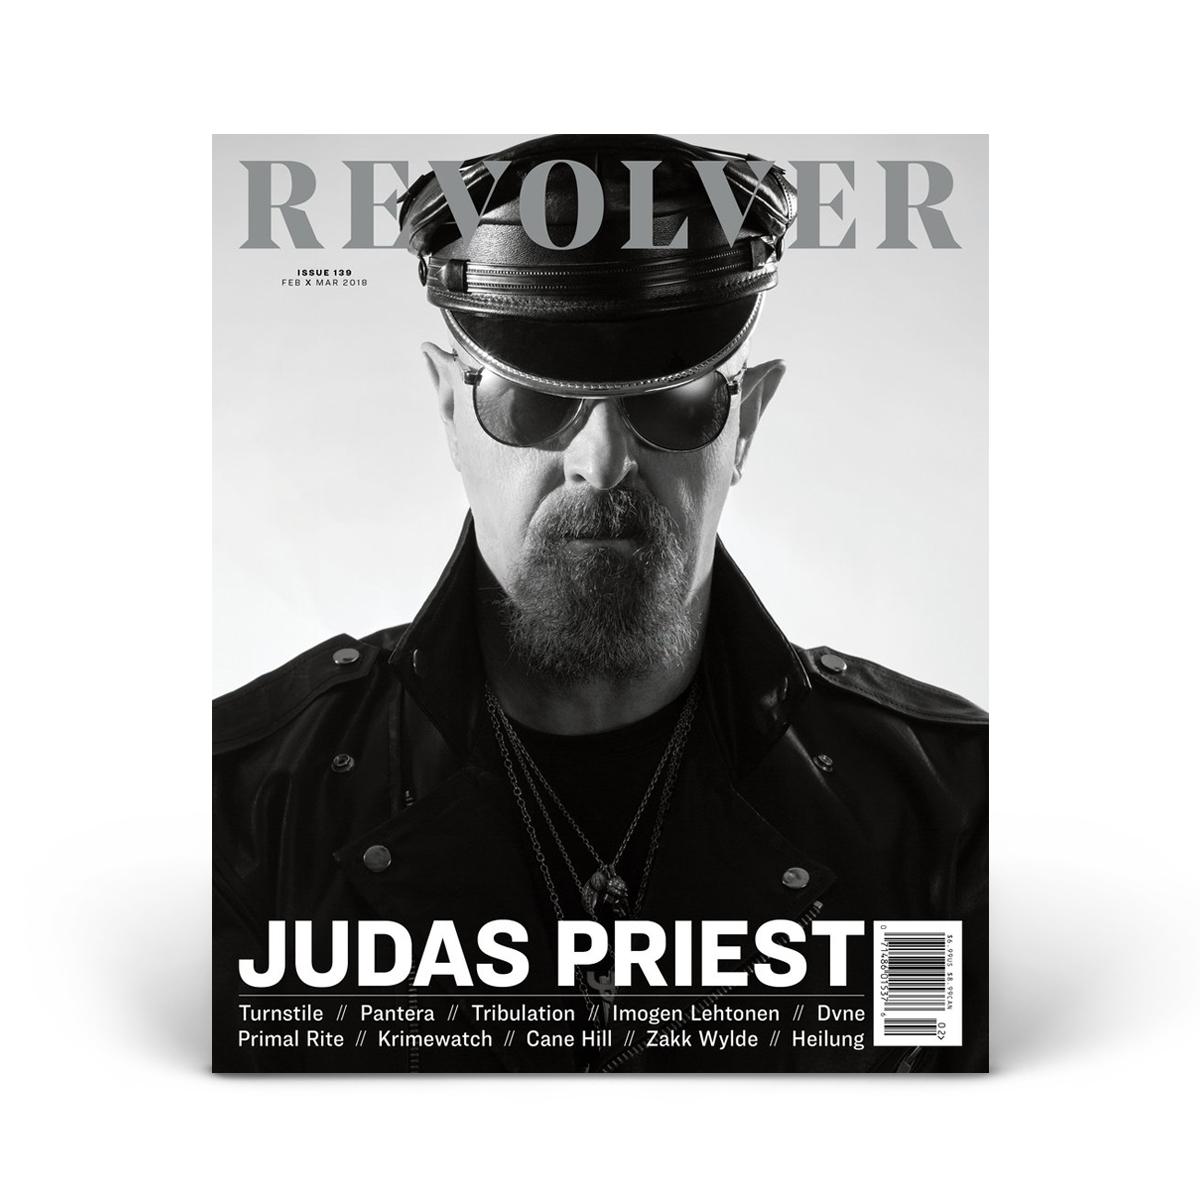 FEB/MAR 2018 Issue featuring Judas Priest